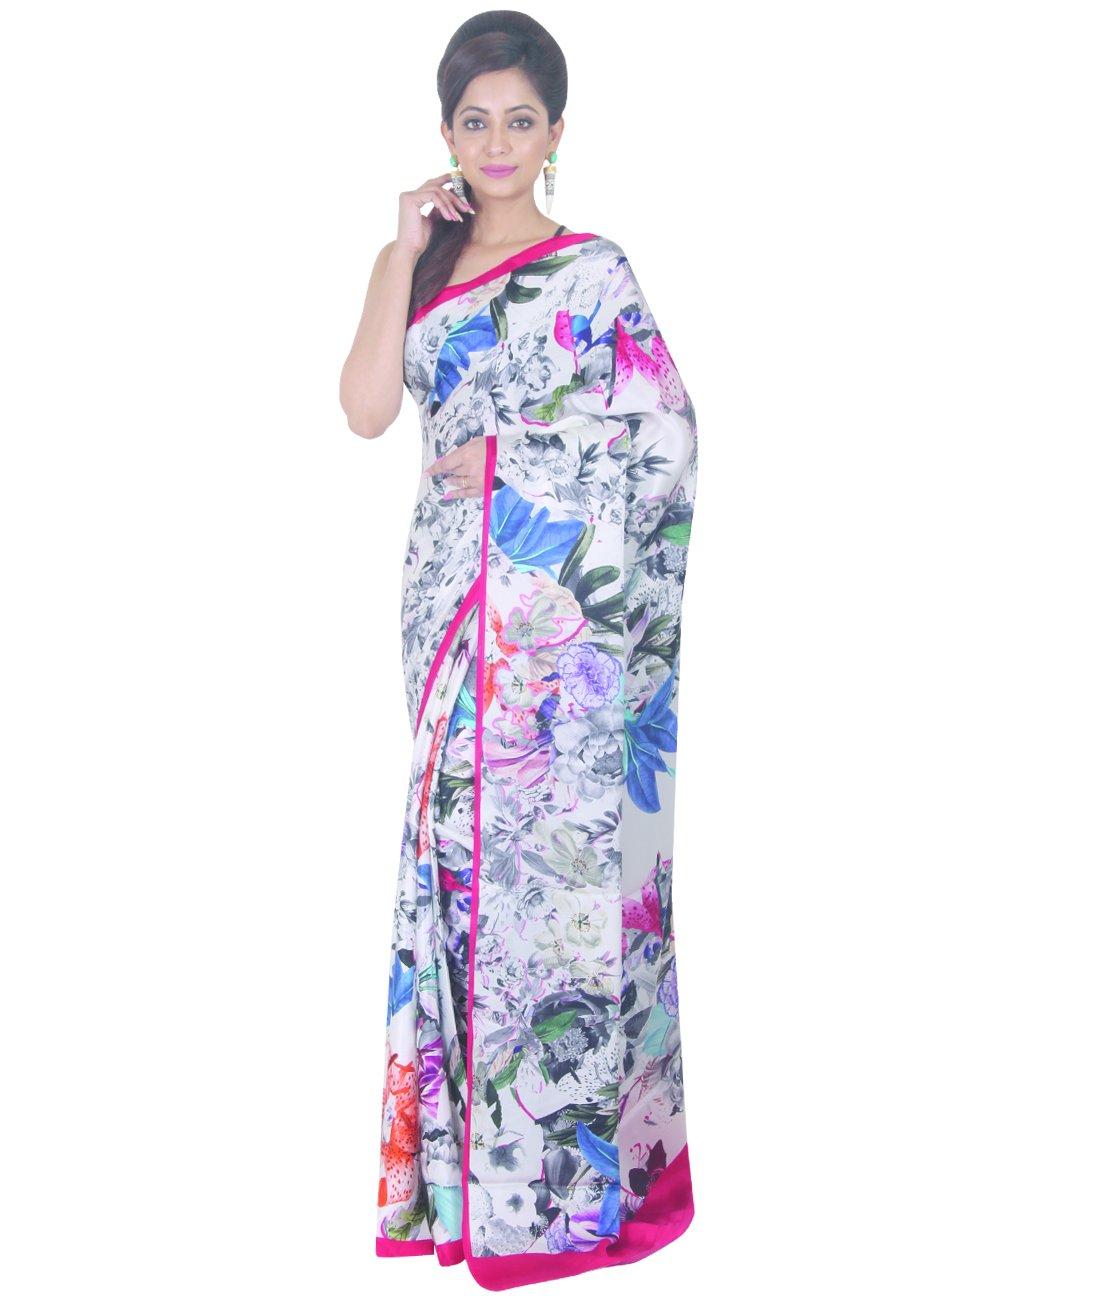 Indian Ethnic Crepe Multicolour Printed Saree by Simaaya Fashions Pvt Ltd (Image #1)